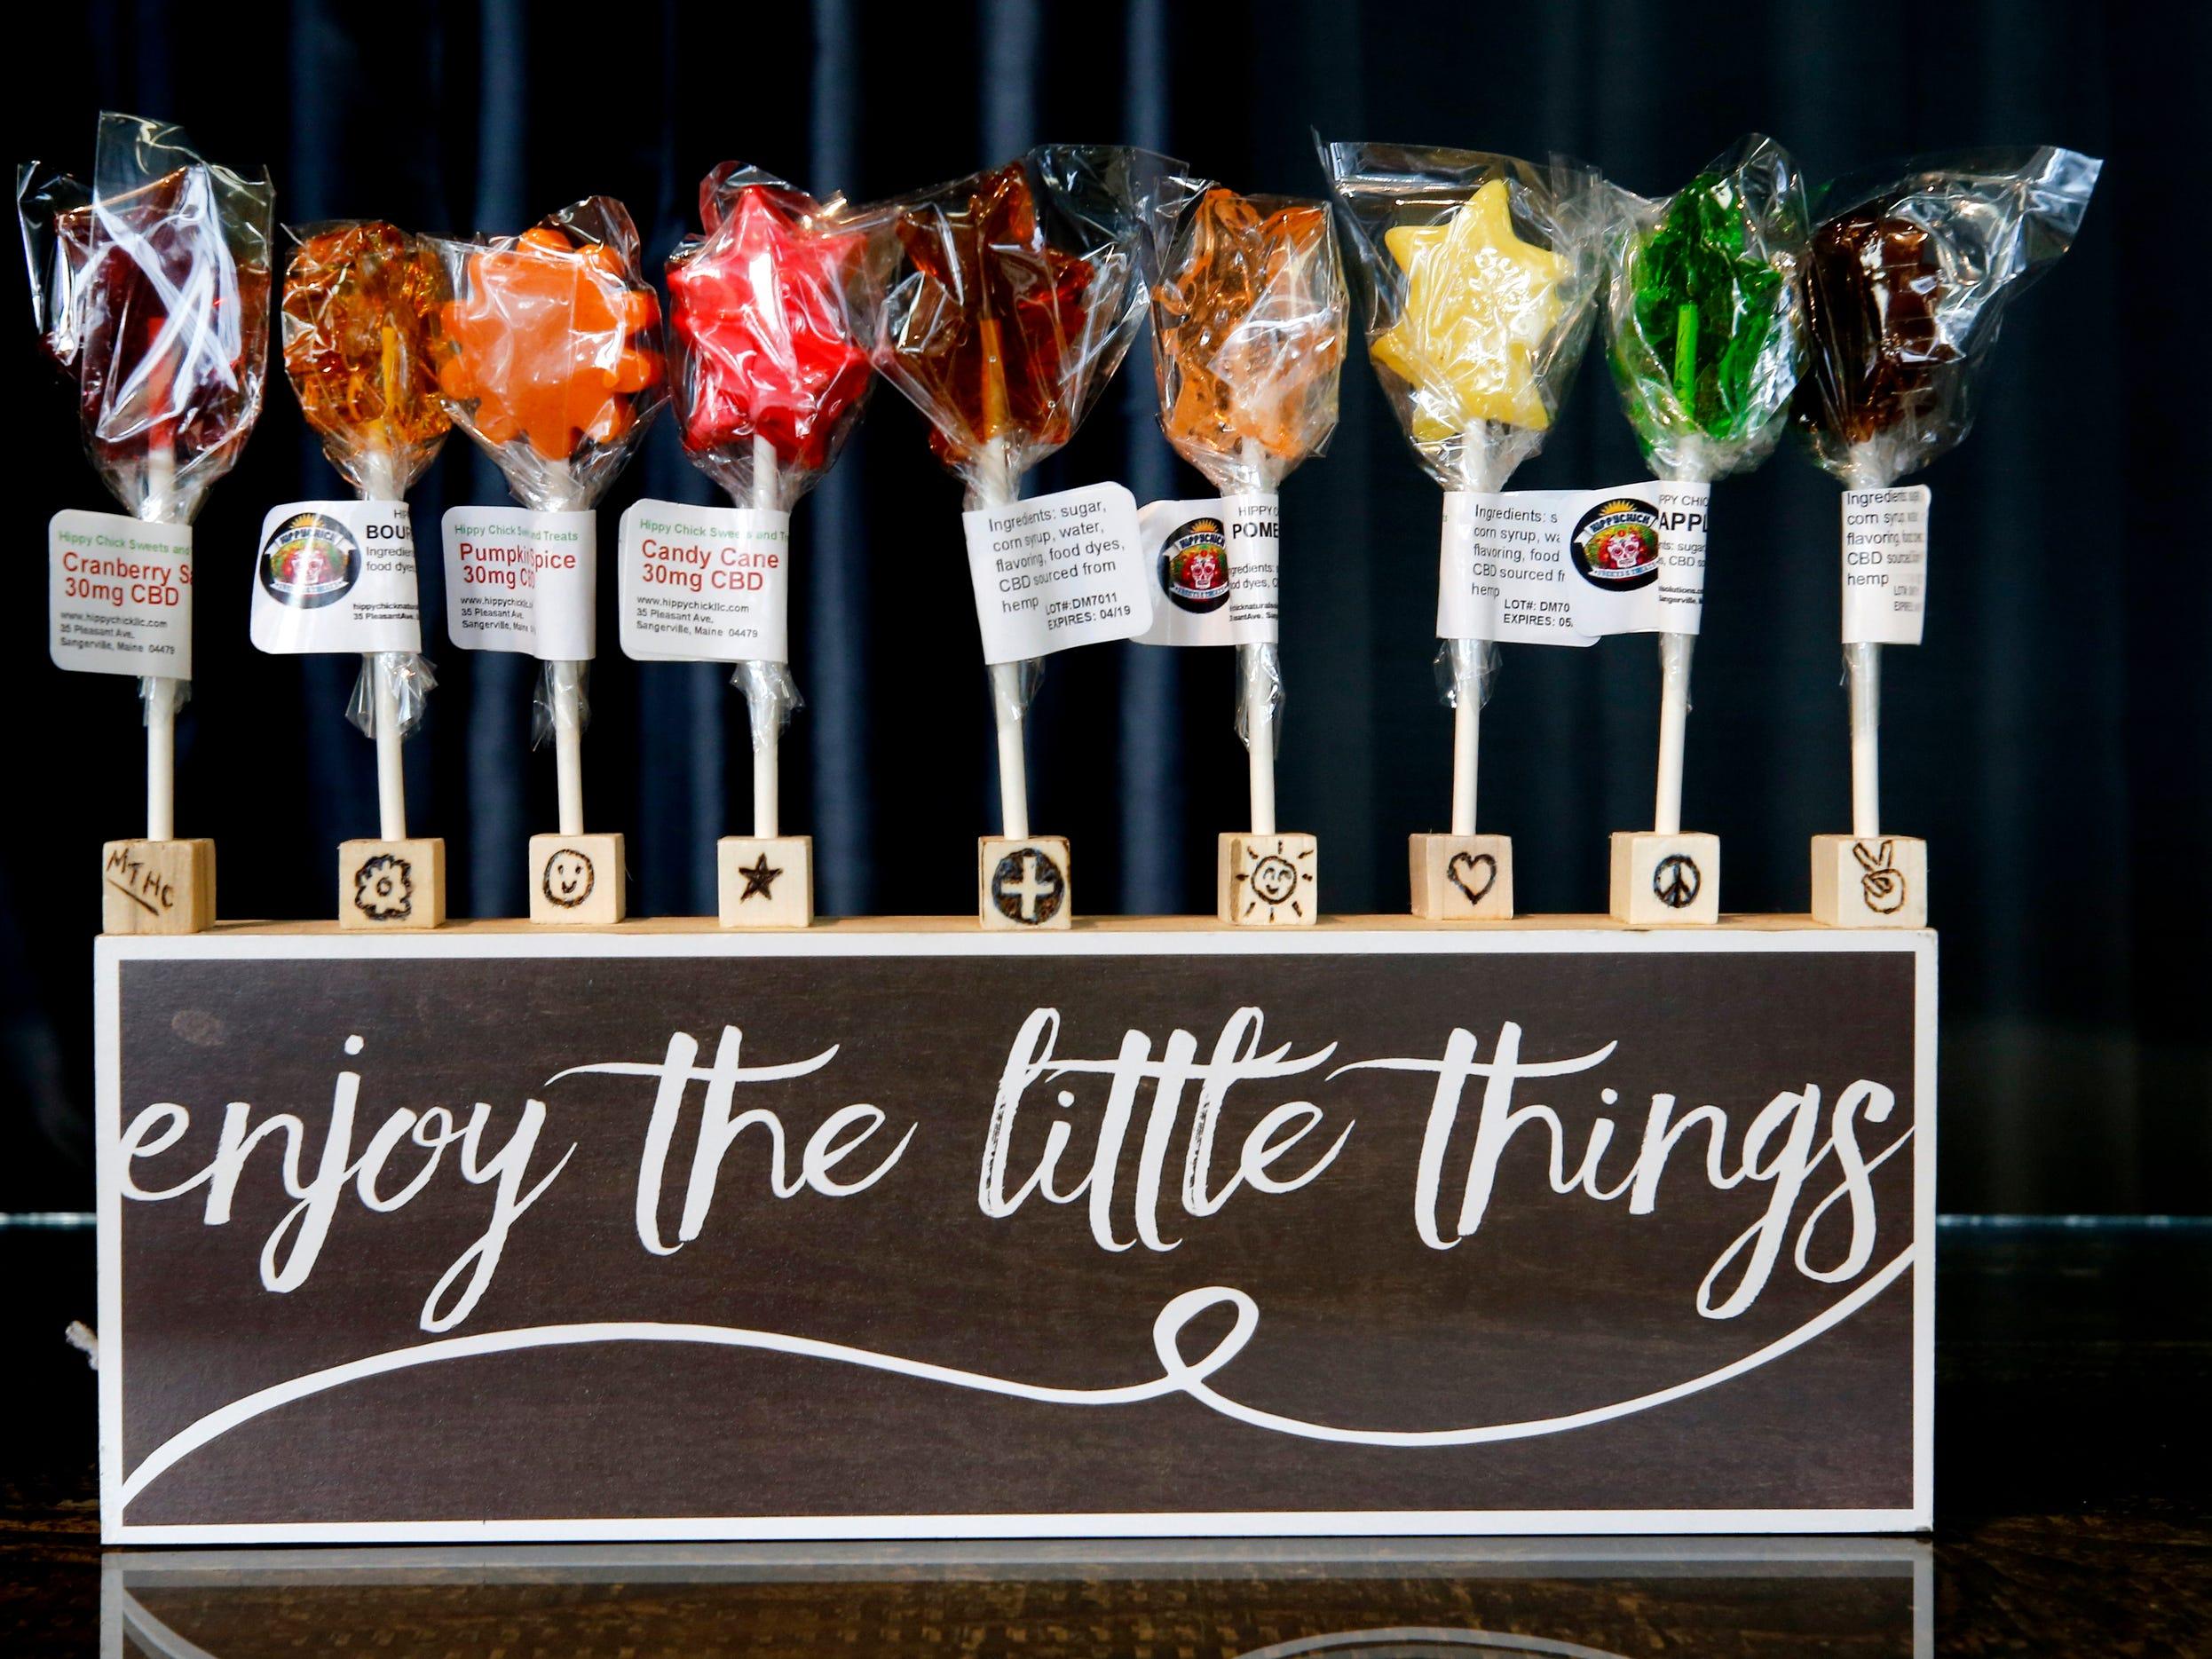 CBD lollipops from Frog Brigade Farmacy on Wednesday, Dec. 19, 2018.